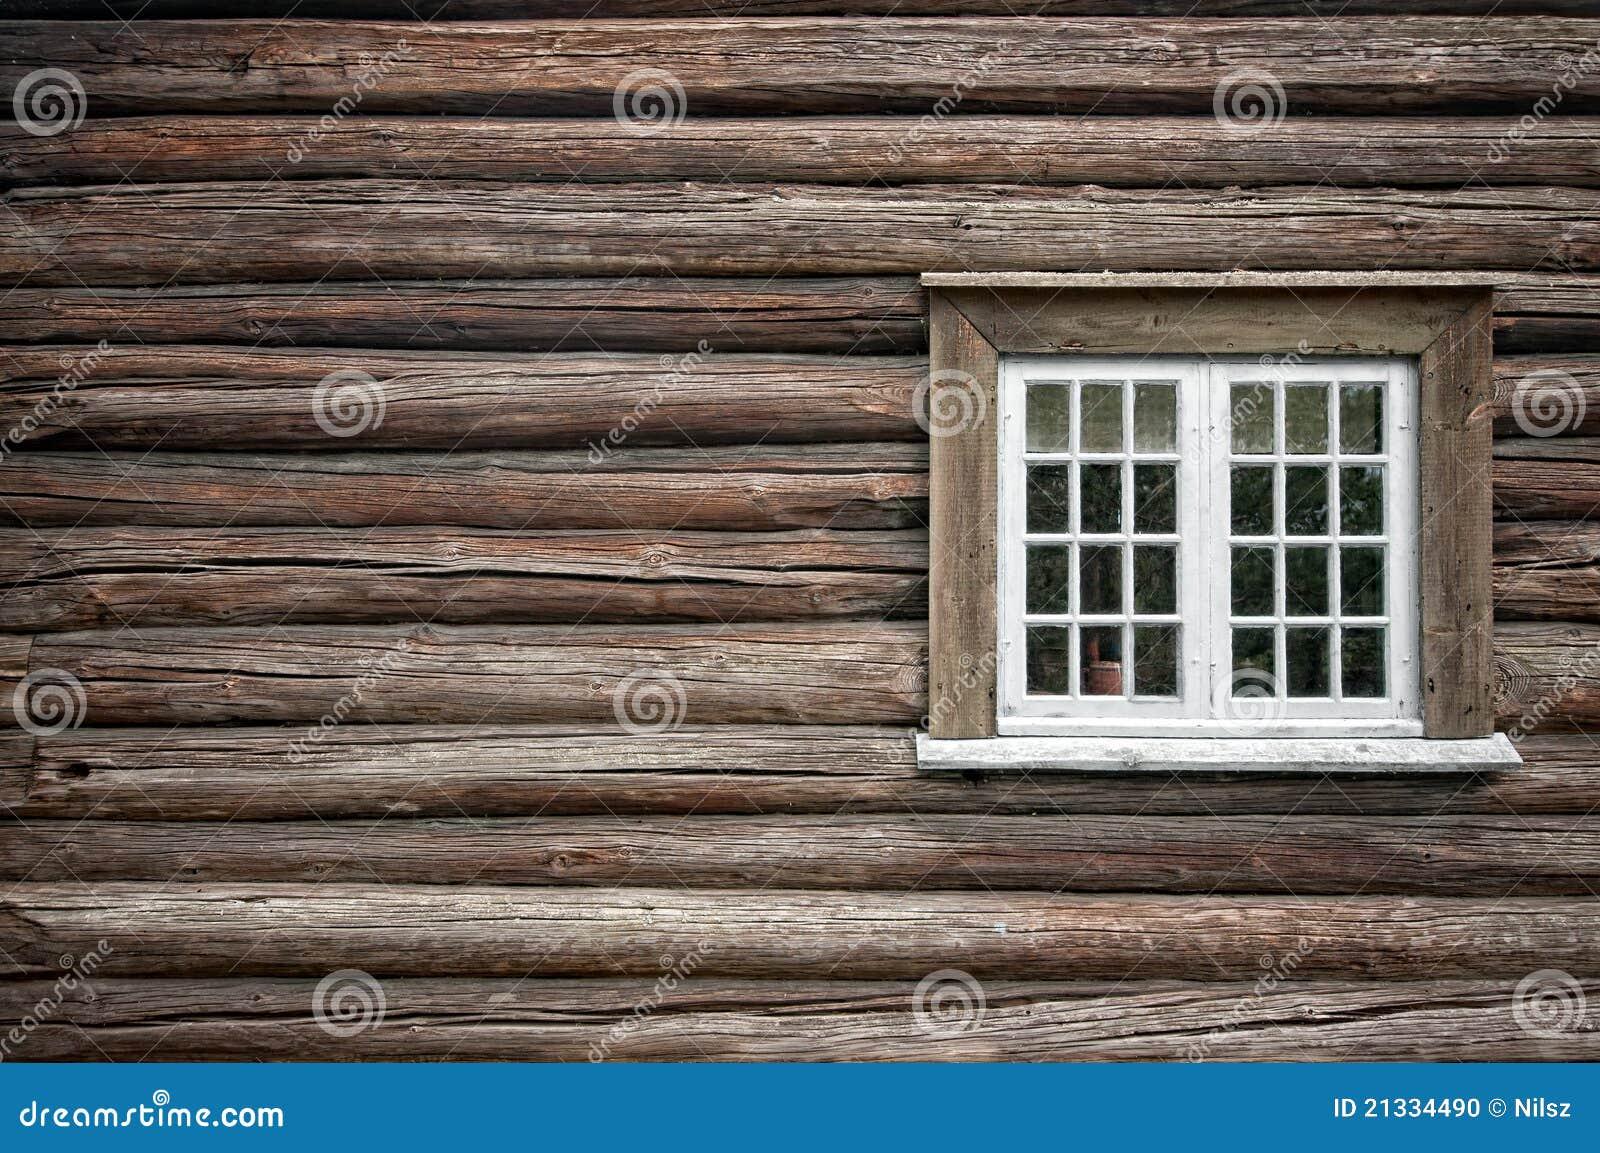 Old Barn Wood Window Stock Photo Image Of Backdrop Aged